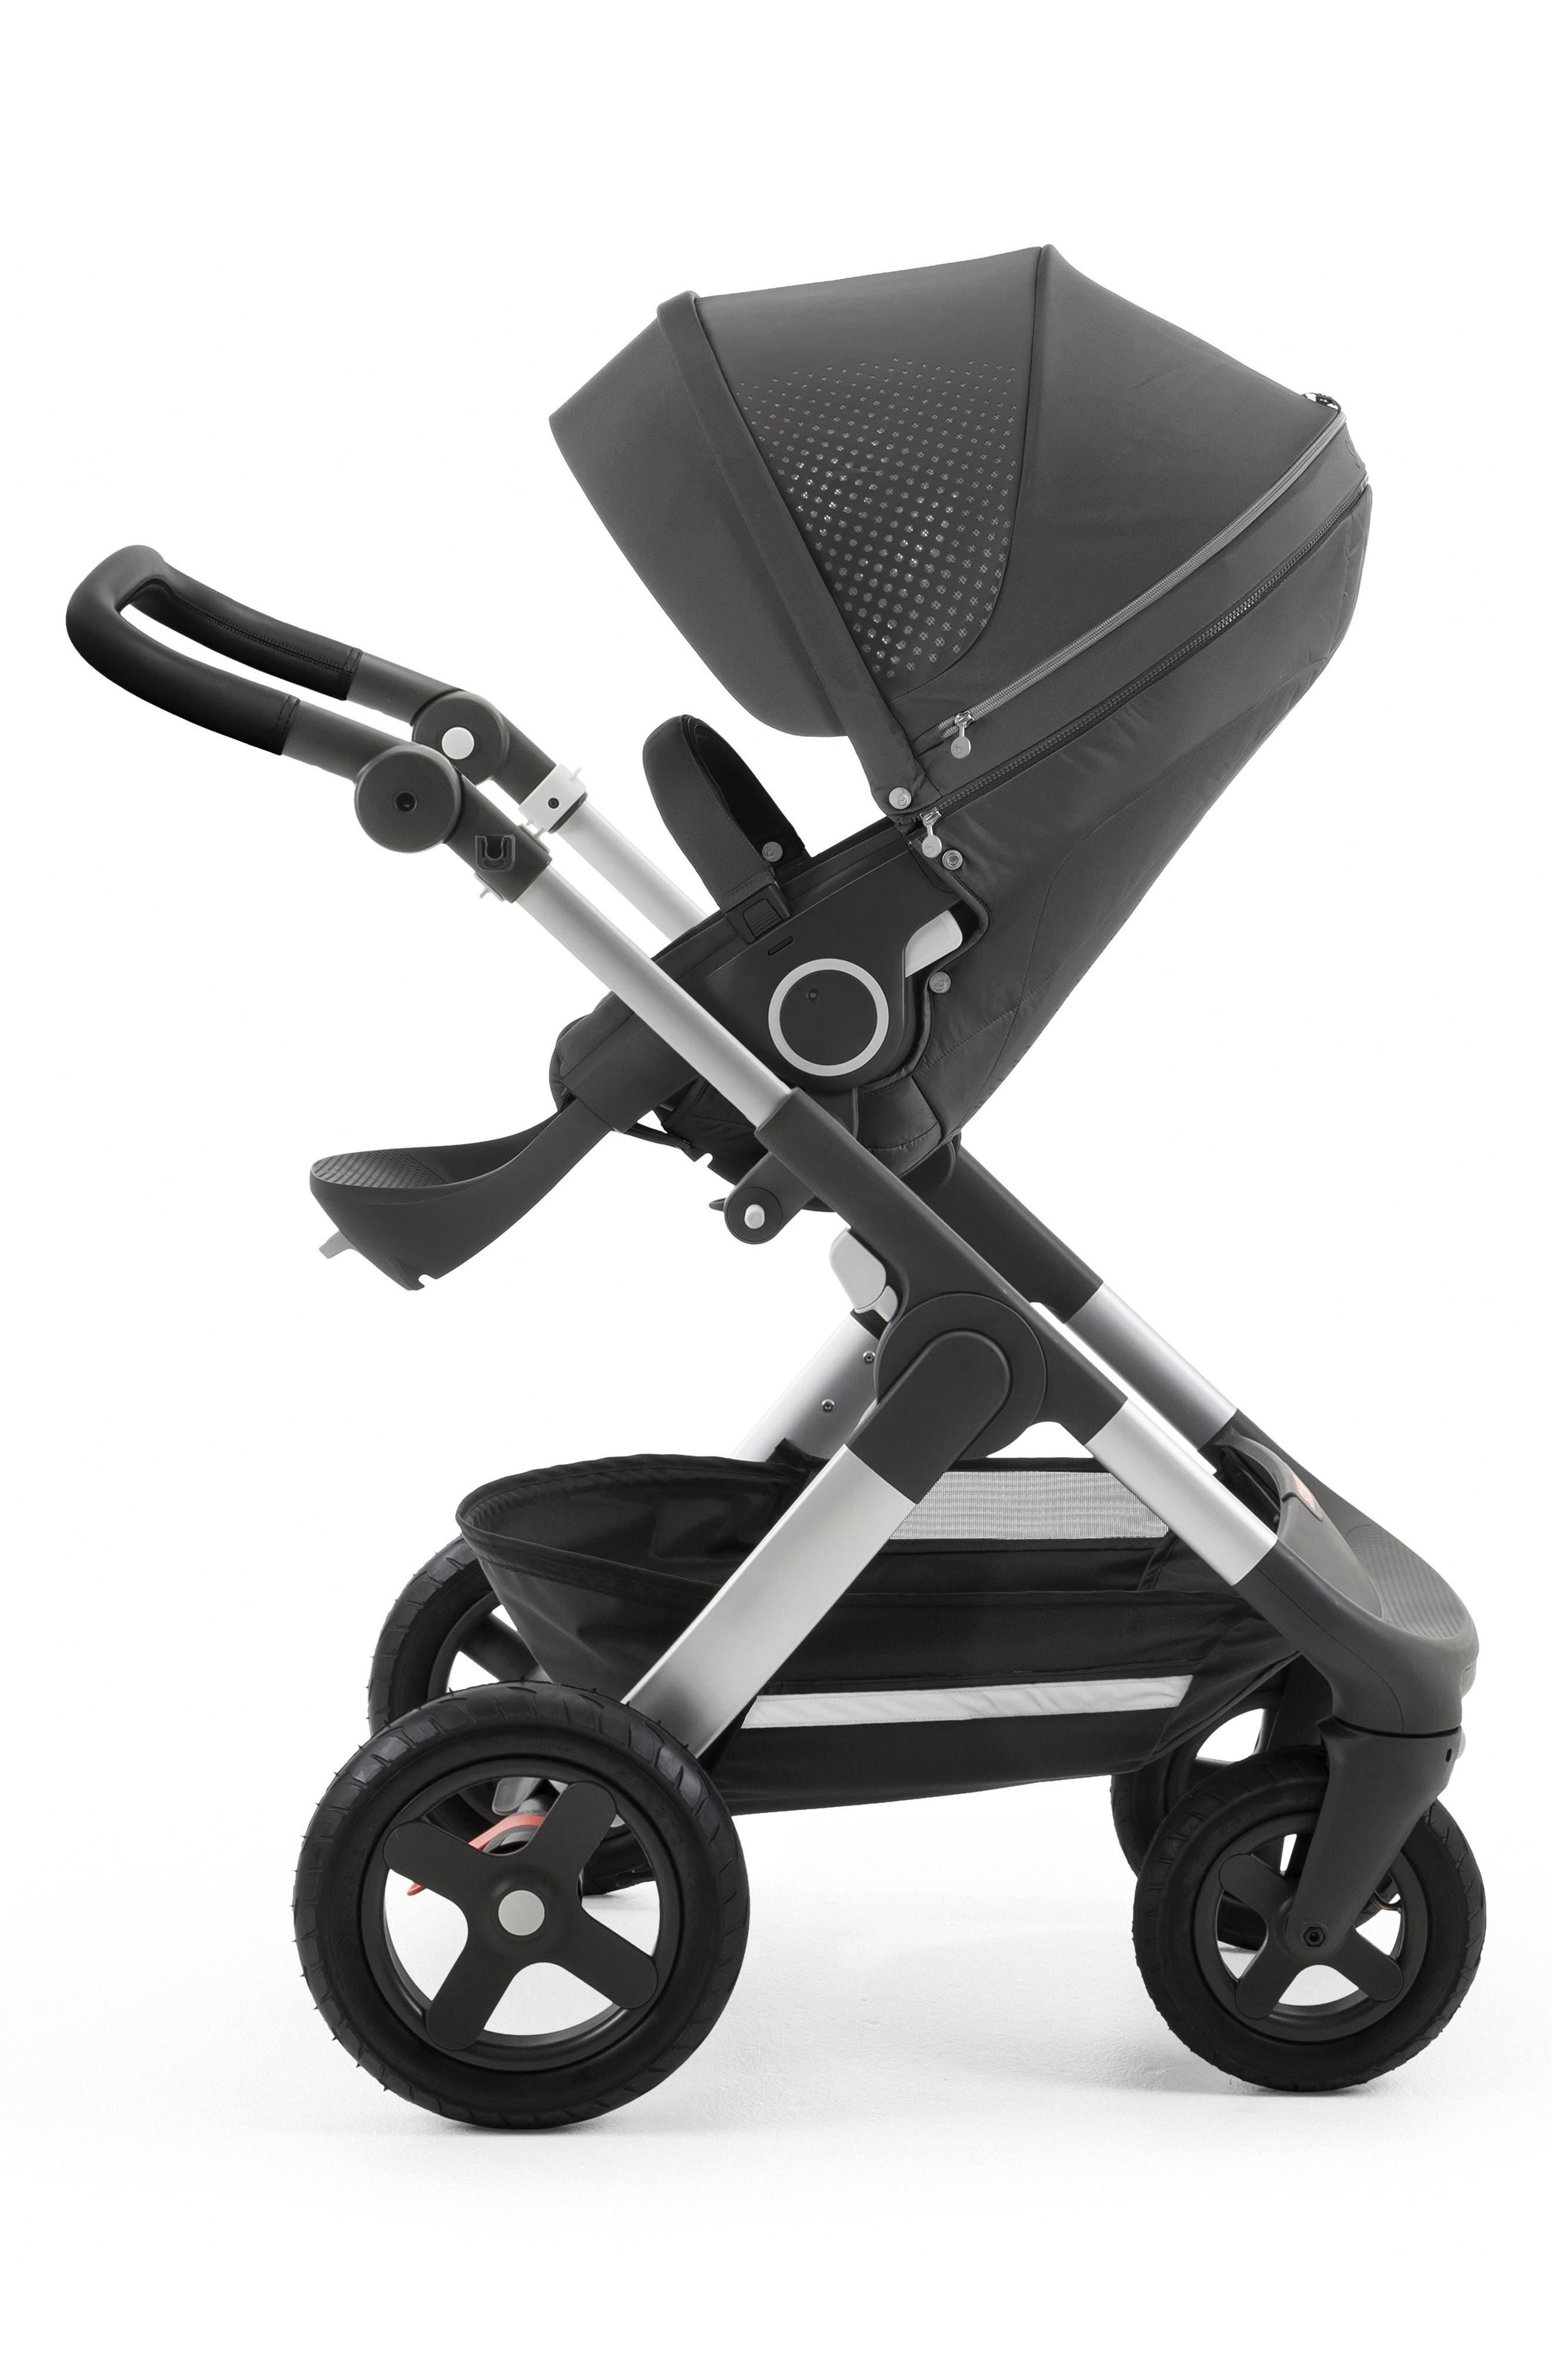 Main Image - Stokke® Trailz Terrain - Athleisure Limited Edition Stroller